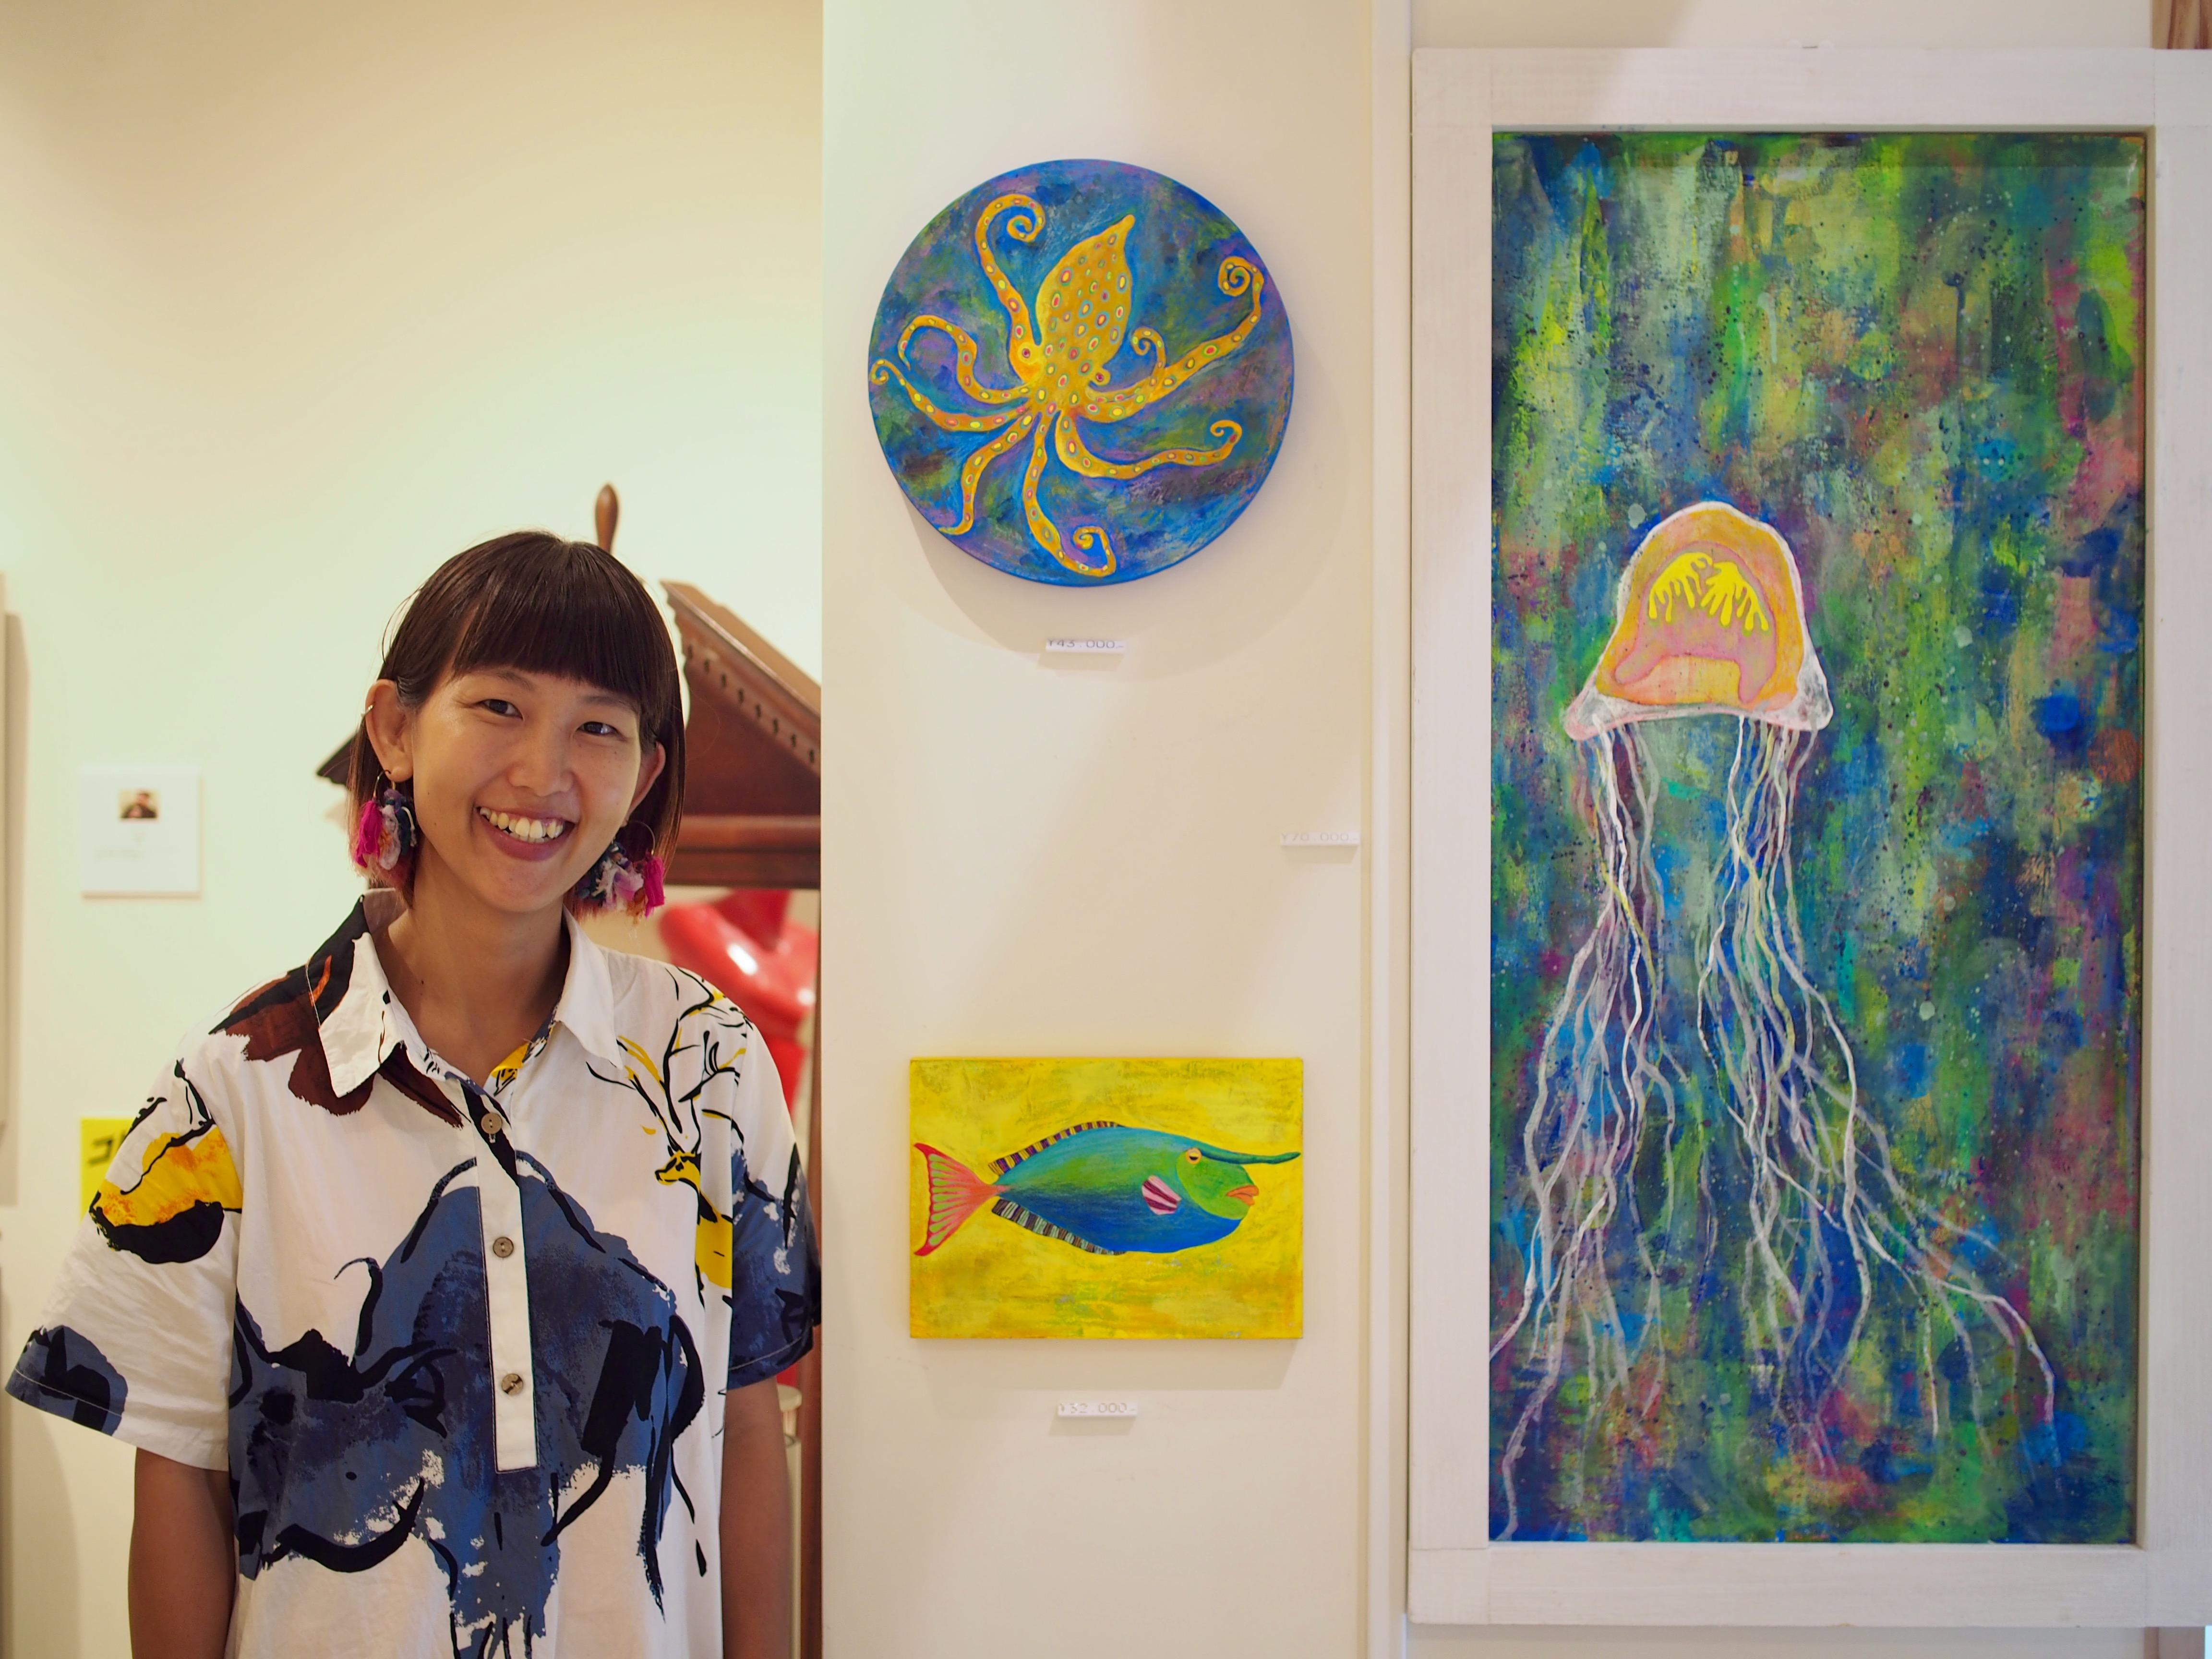 Artist Interview▶︎生命力あふれる生き物たちを描く、MEGU WAZOUSKI